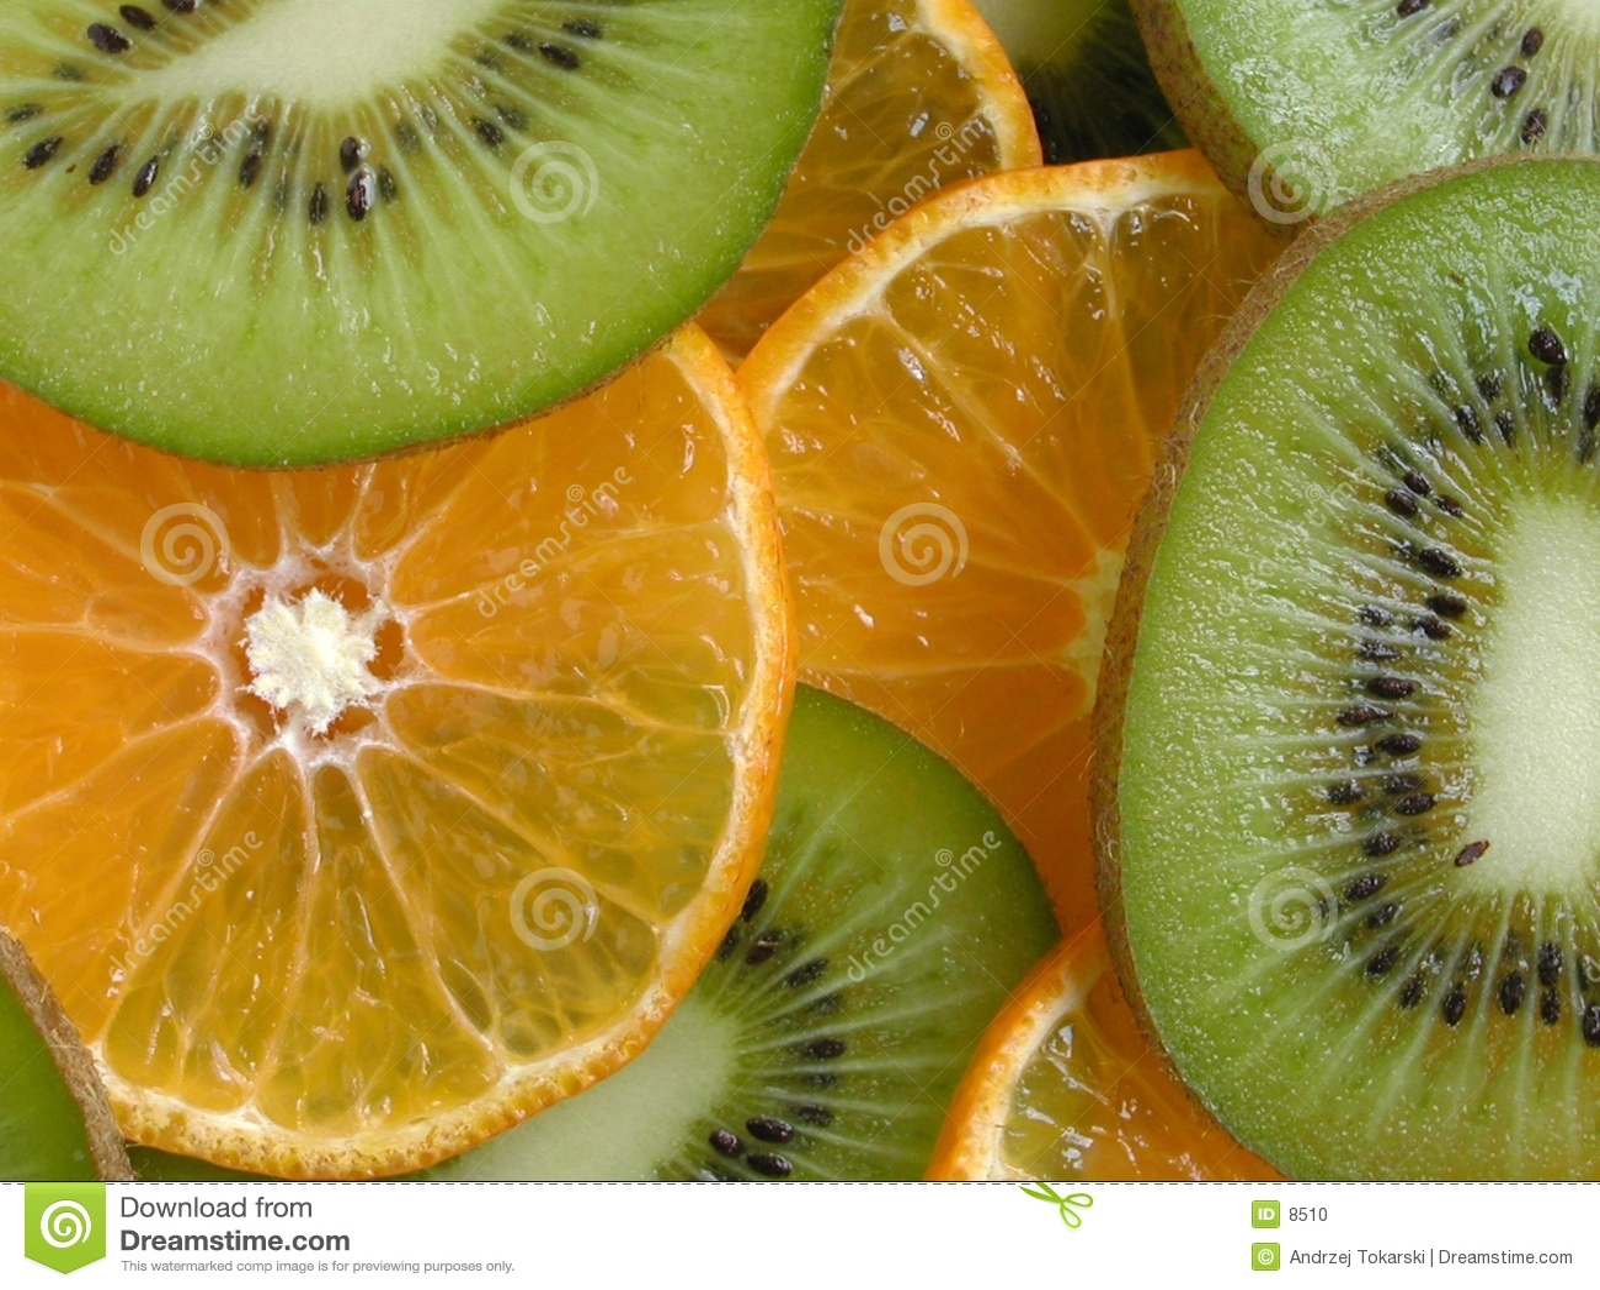 Orange and Kiwi Slices